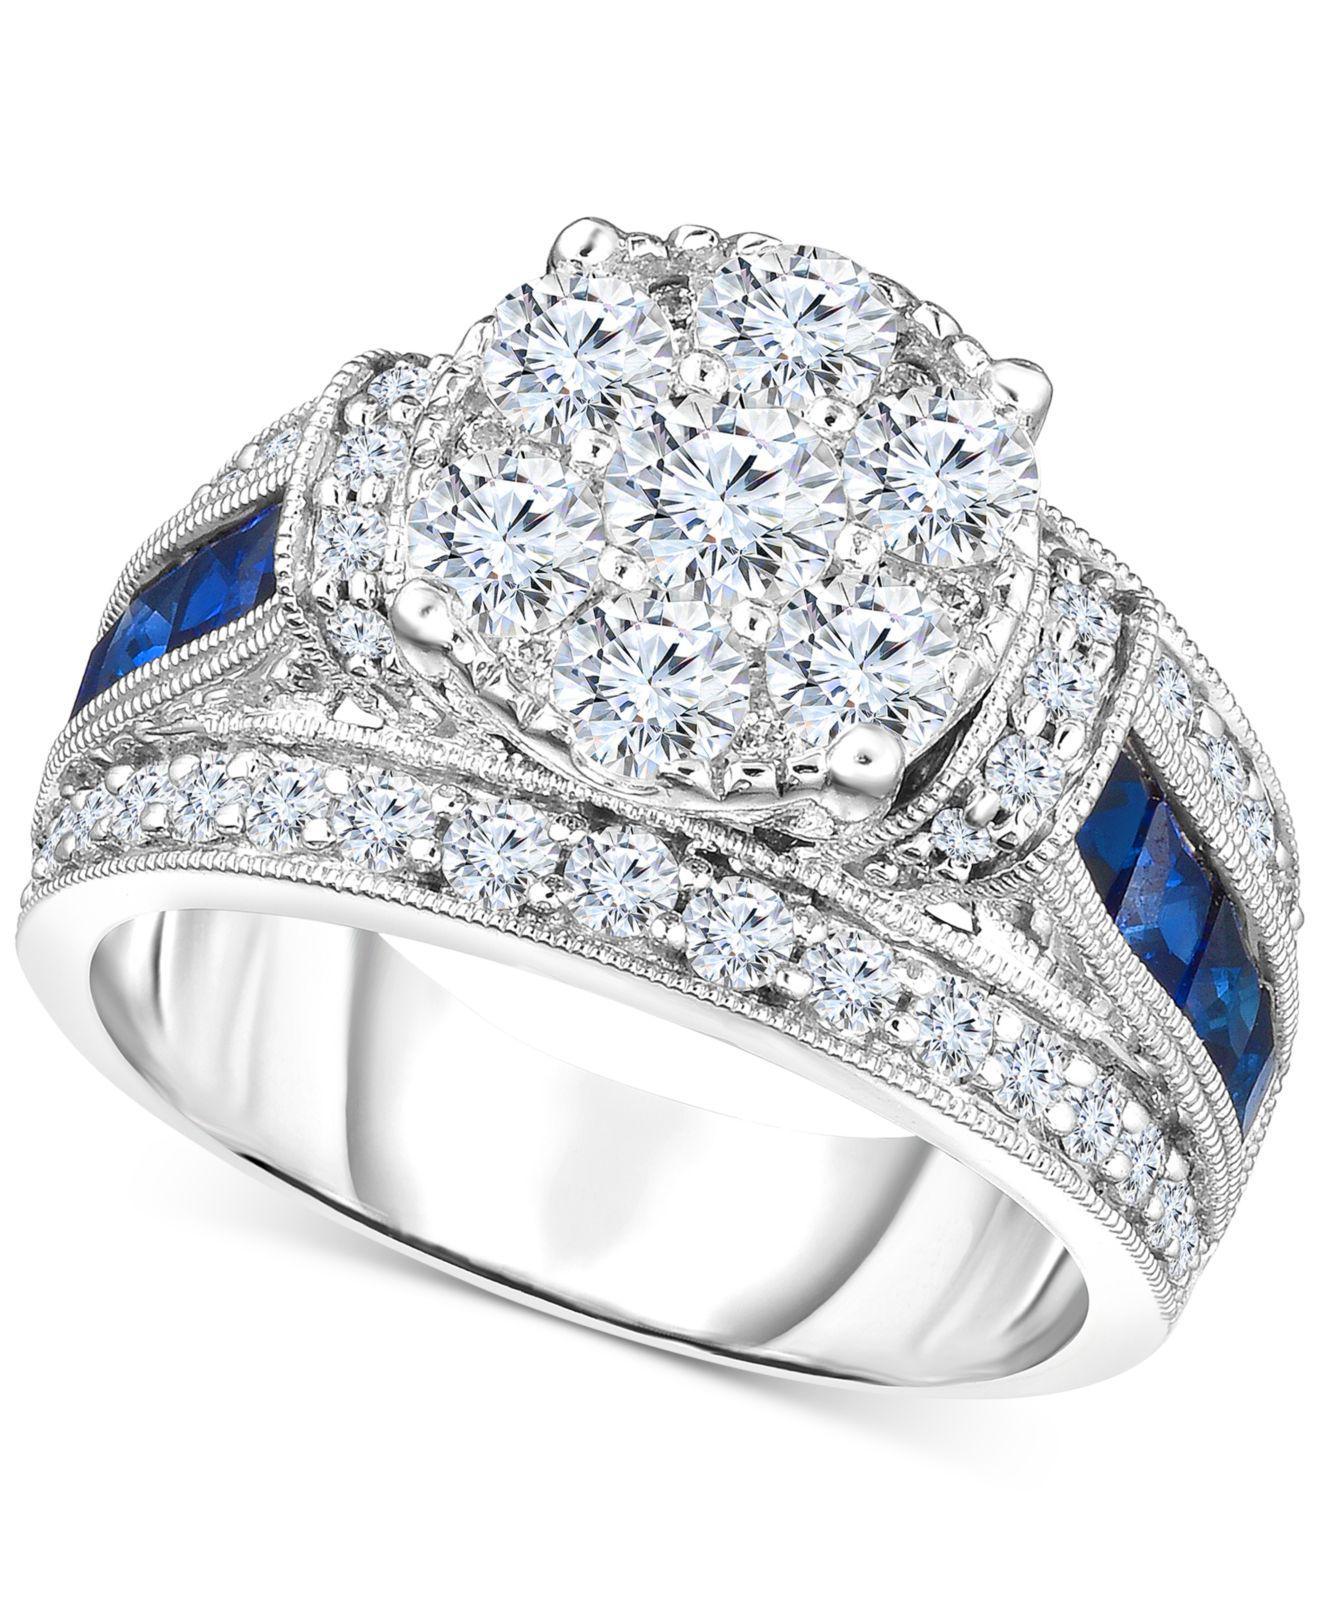 63ebaba24 Lyst - Macy's Trumiracletm Diamond (1-3/4 Ct. T.w.) & Sapphire (1 Ct ...